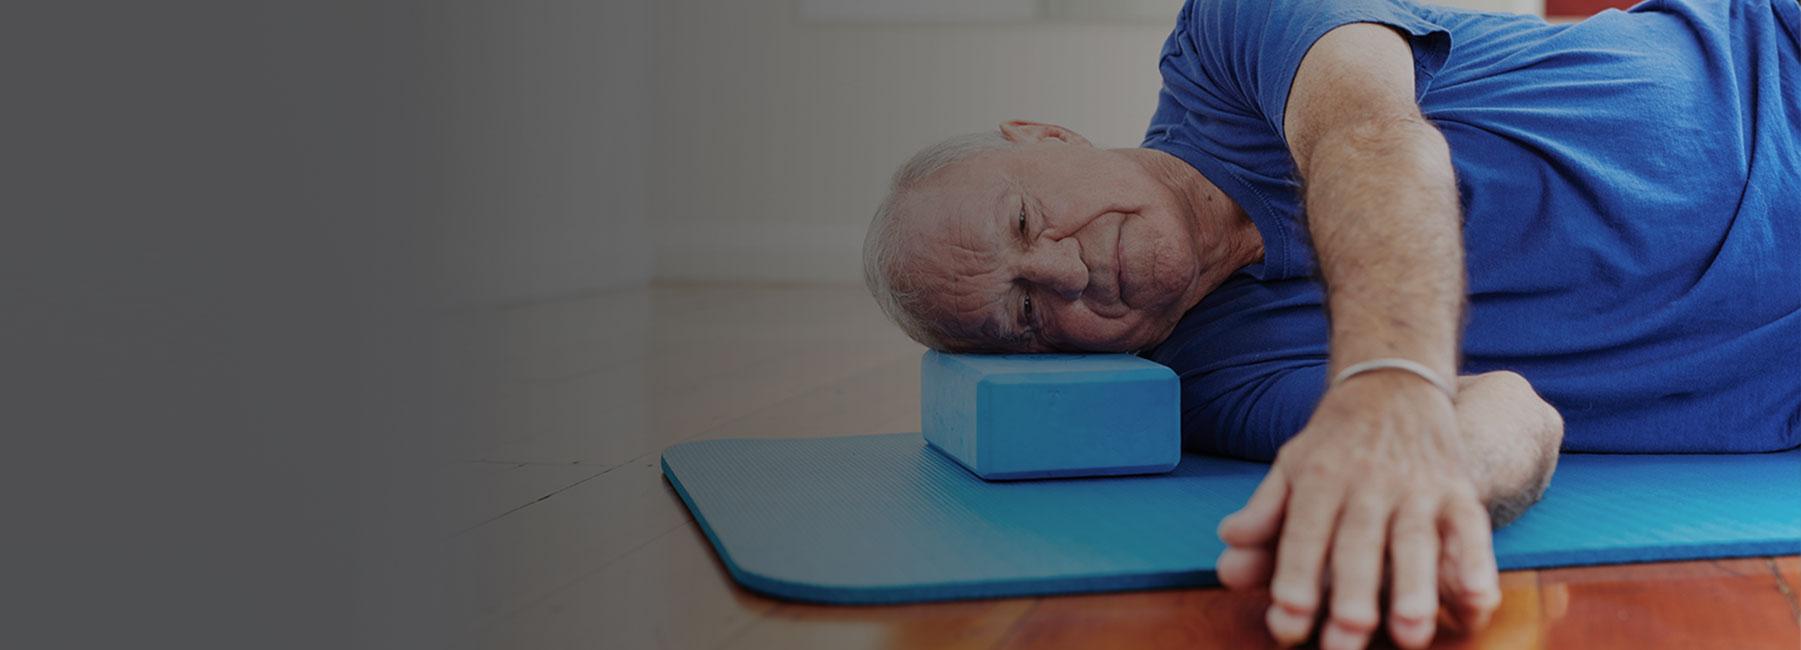 Body Reform Auckland Physio for Elderly Banner 2018